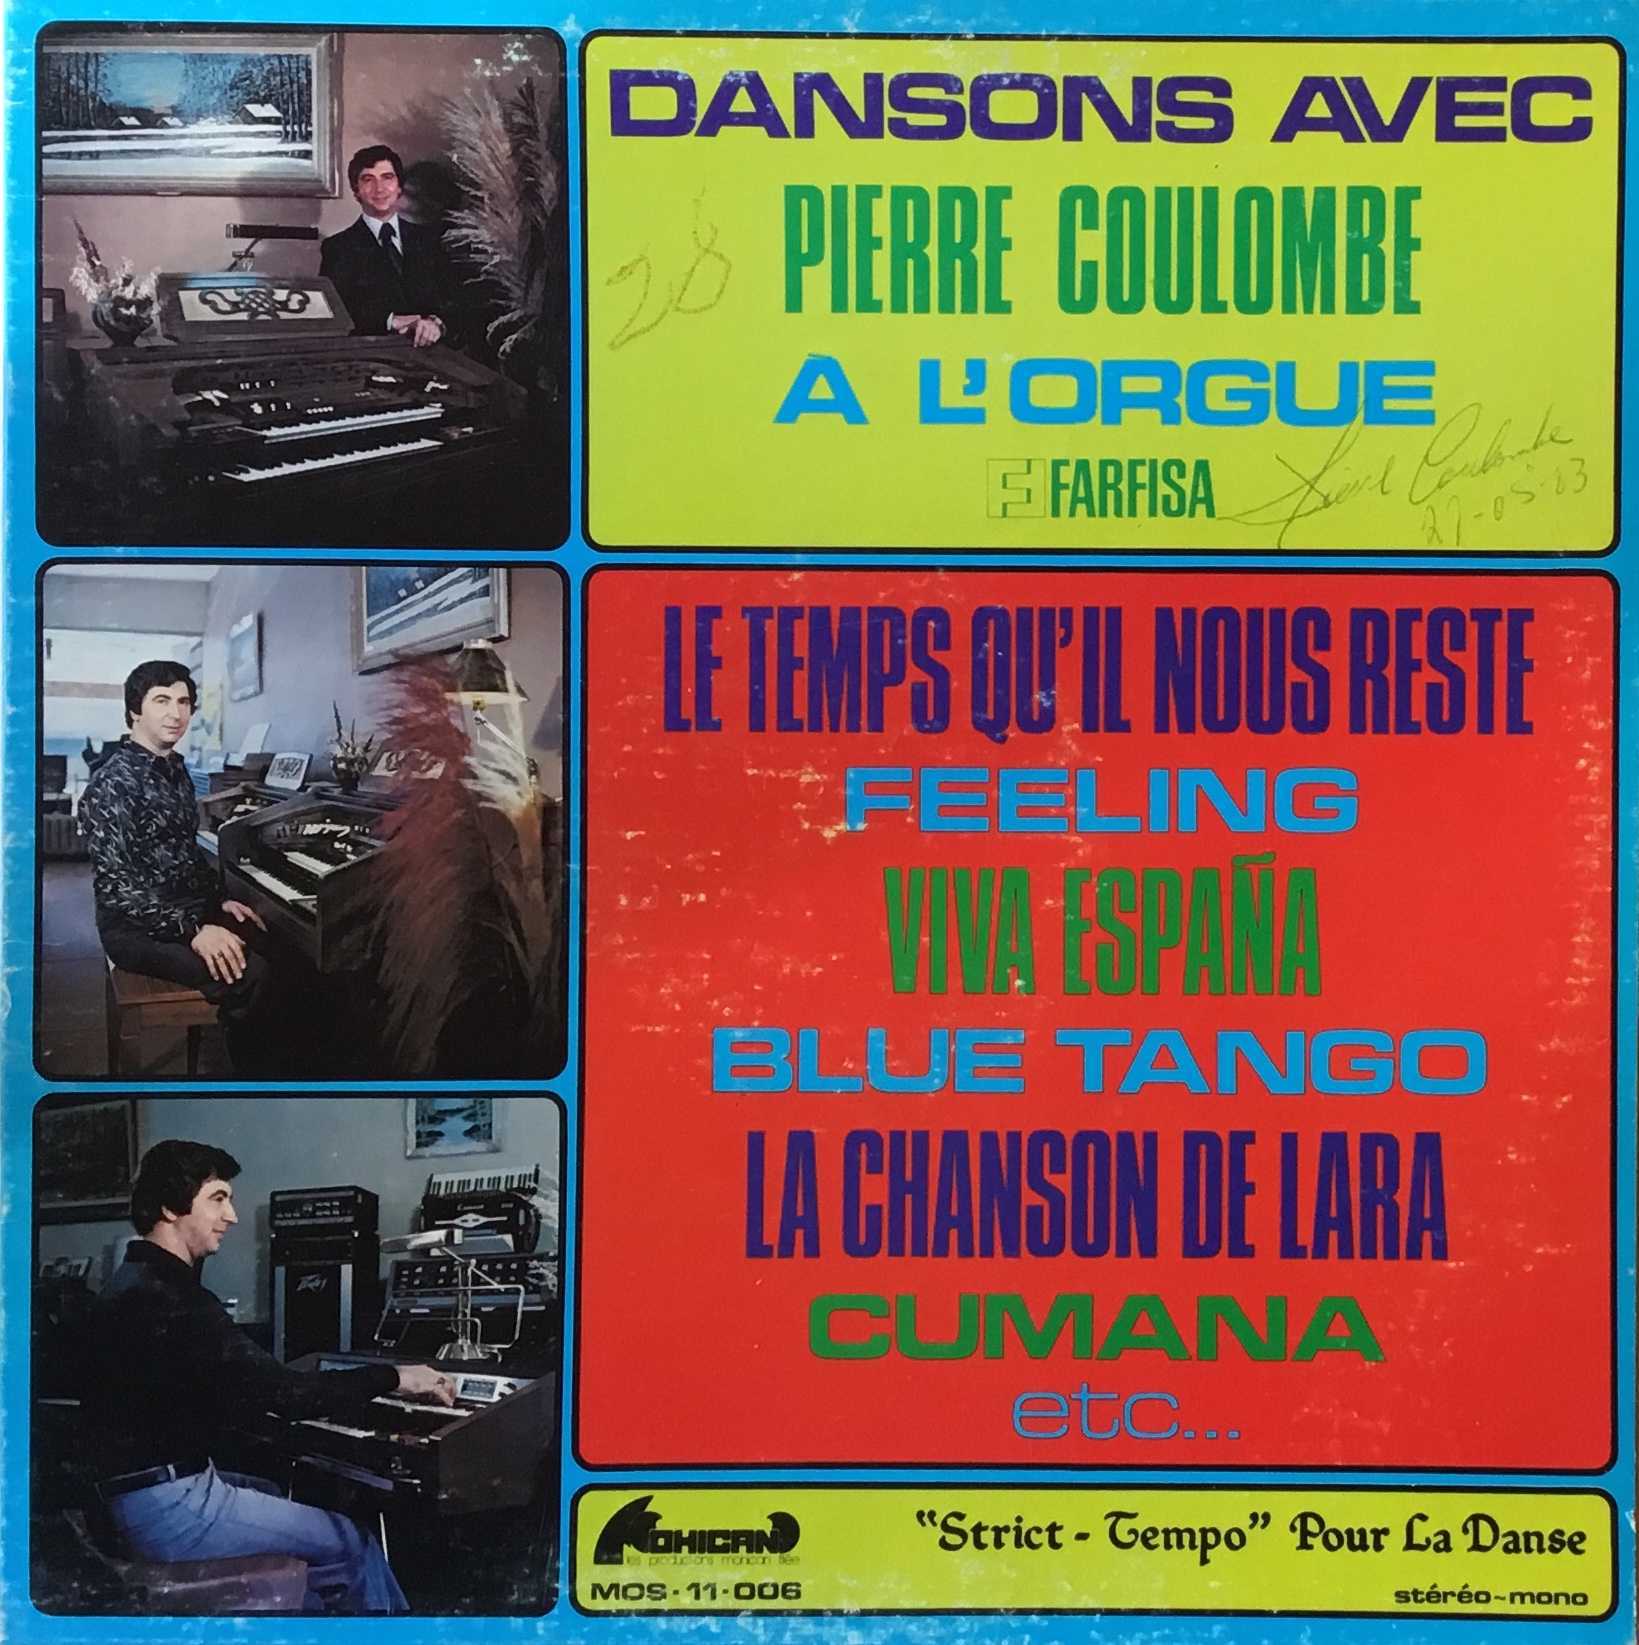 PierreCoulombe_Dansons